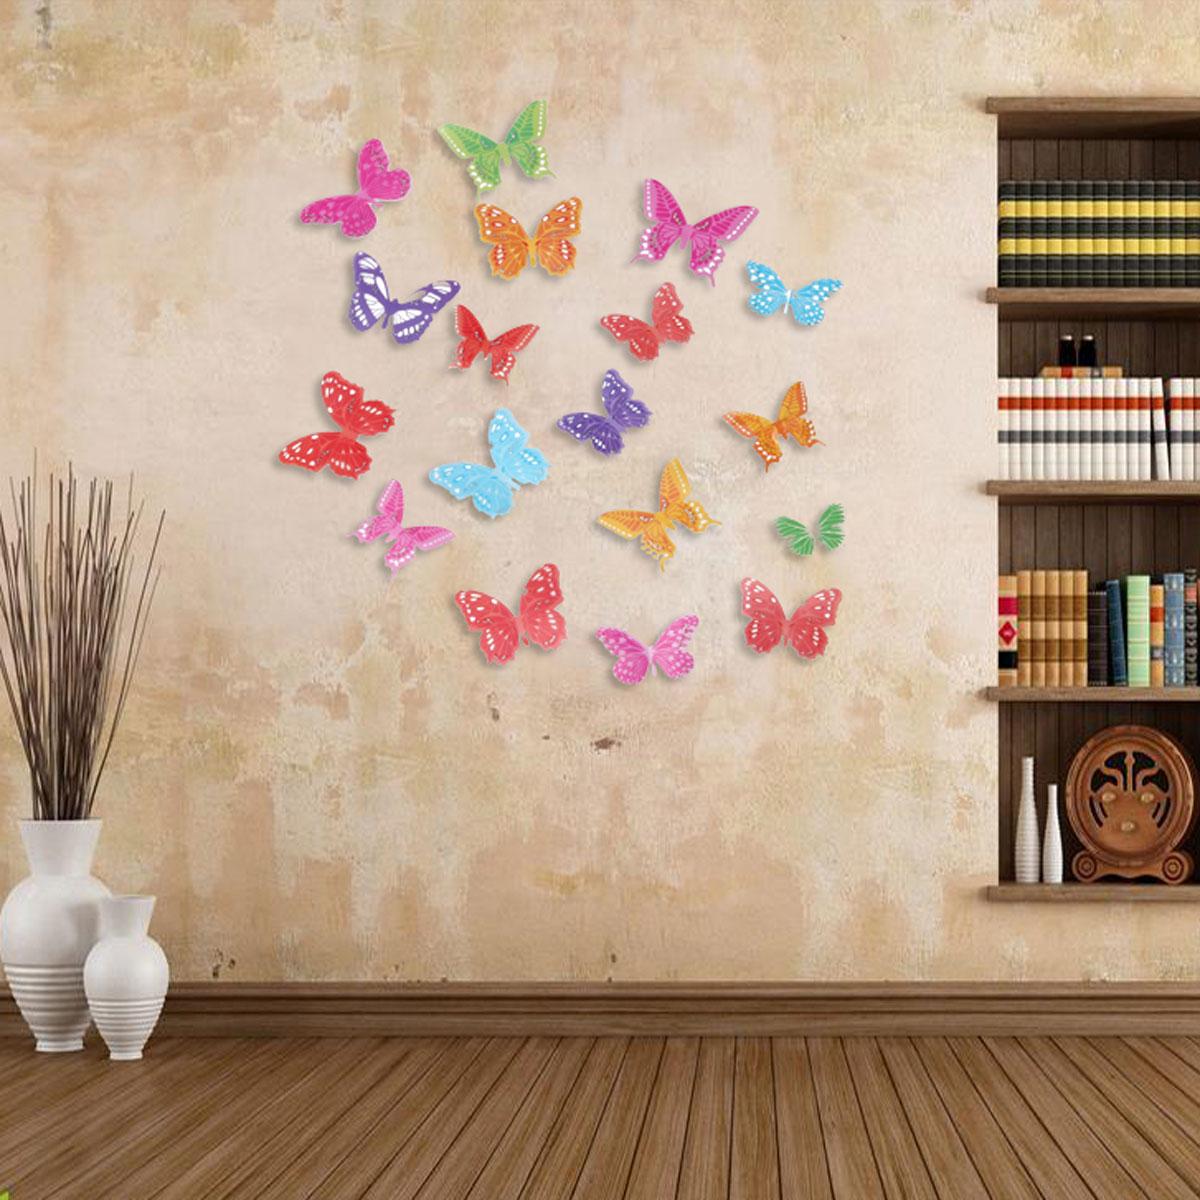 18pcs 3D 다채로운 DIY 스티커 아름다움 나비 벽 가정 예술 전사 술 결혼 파티 장식 선물